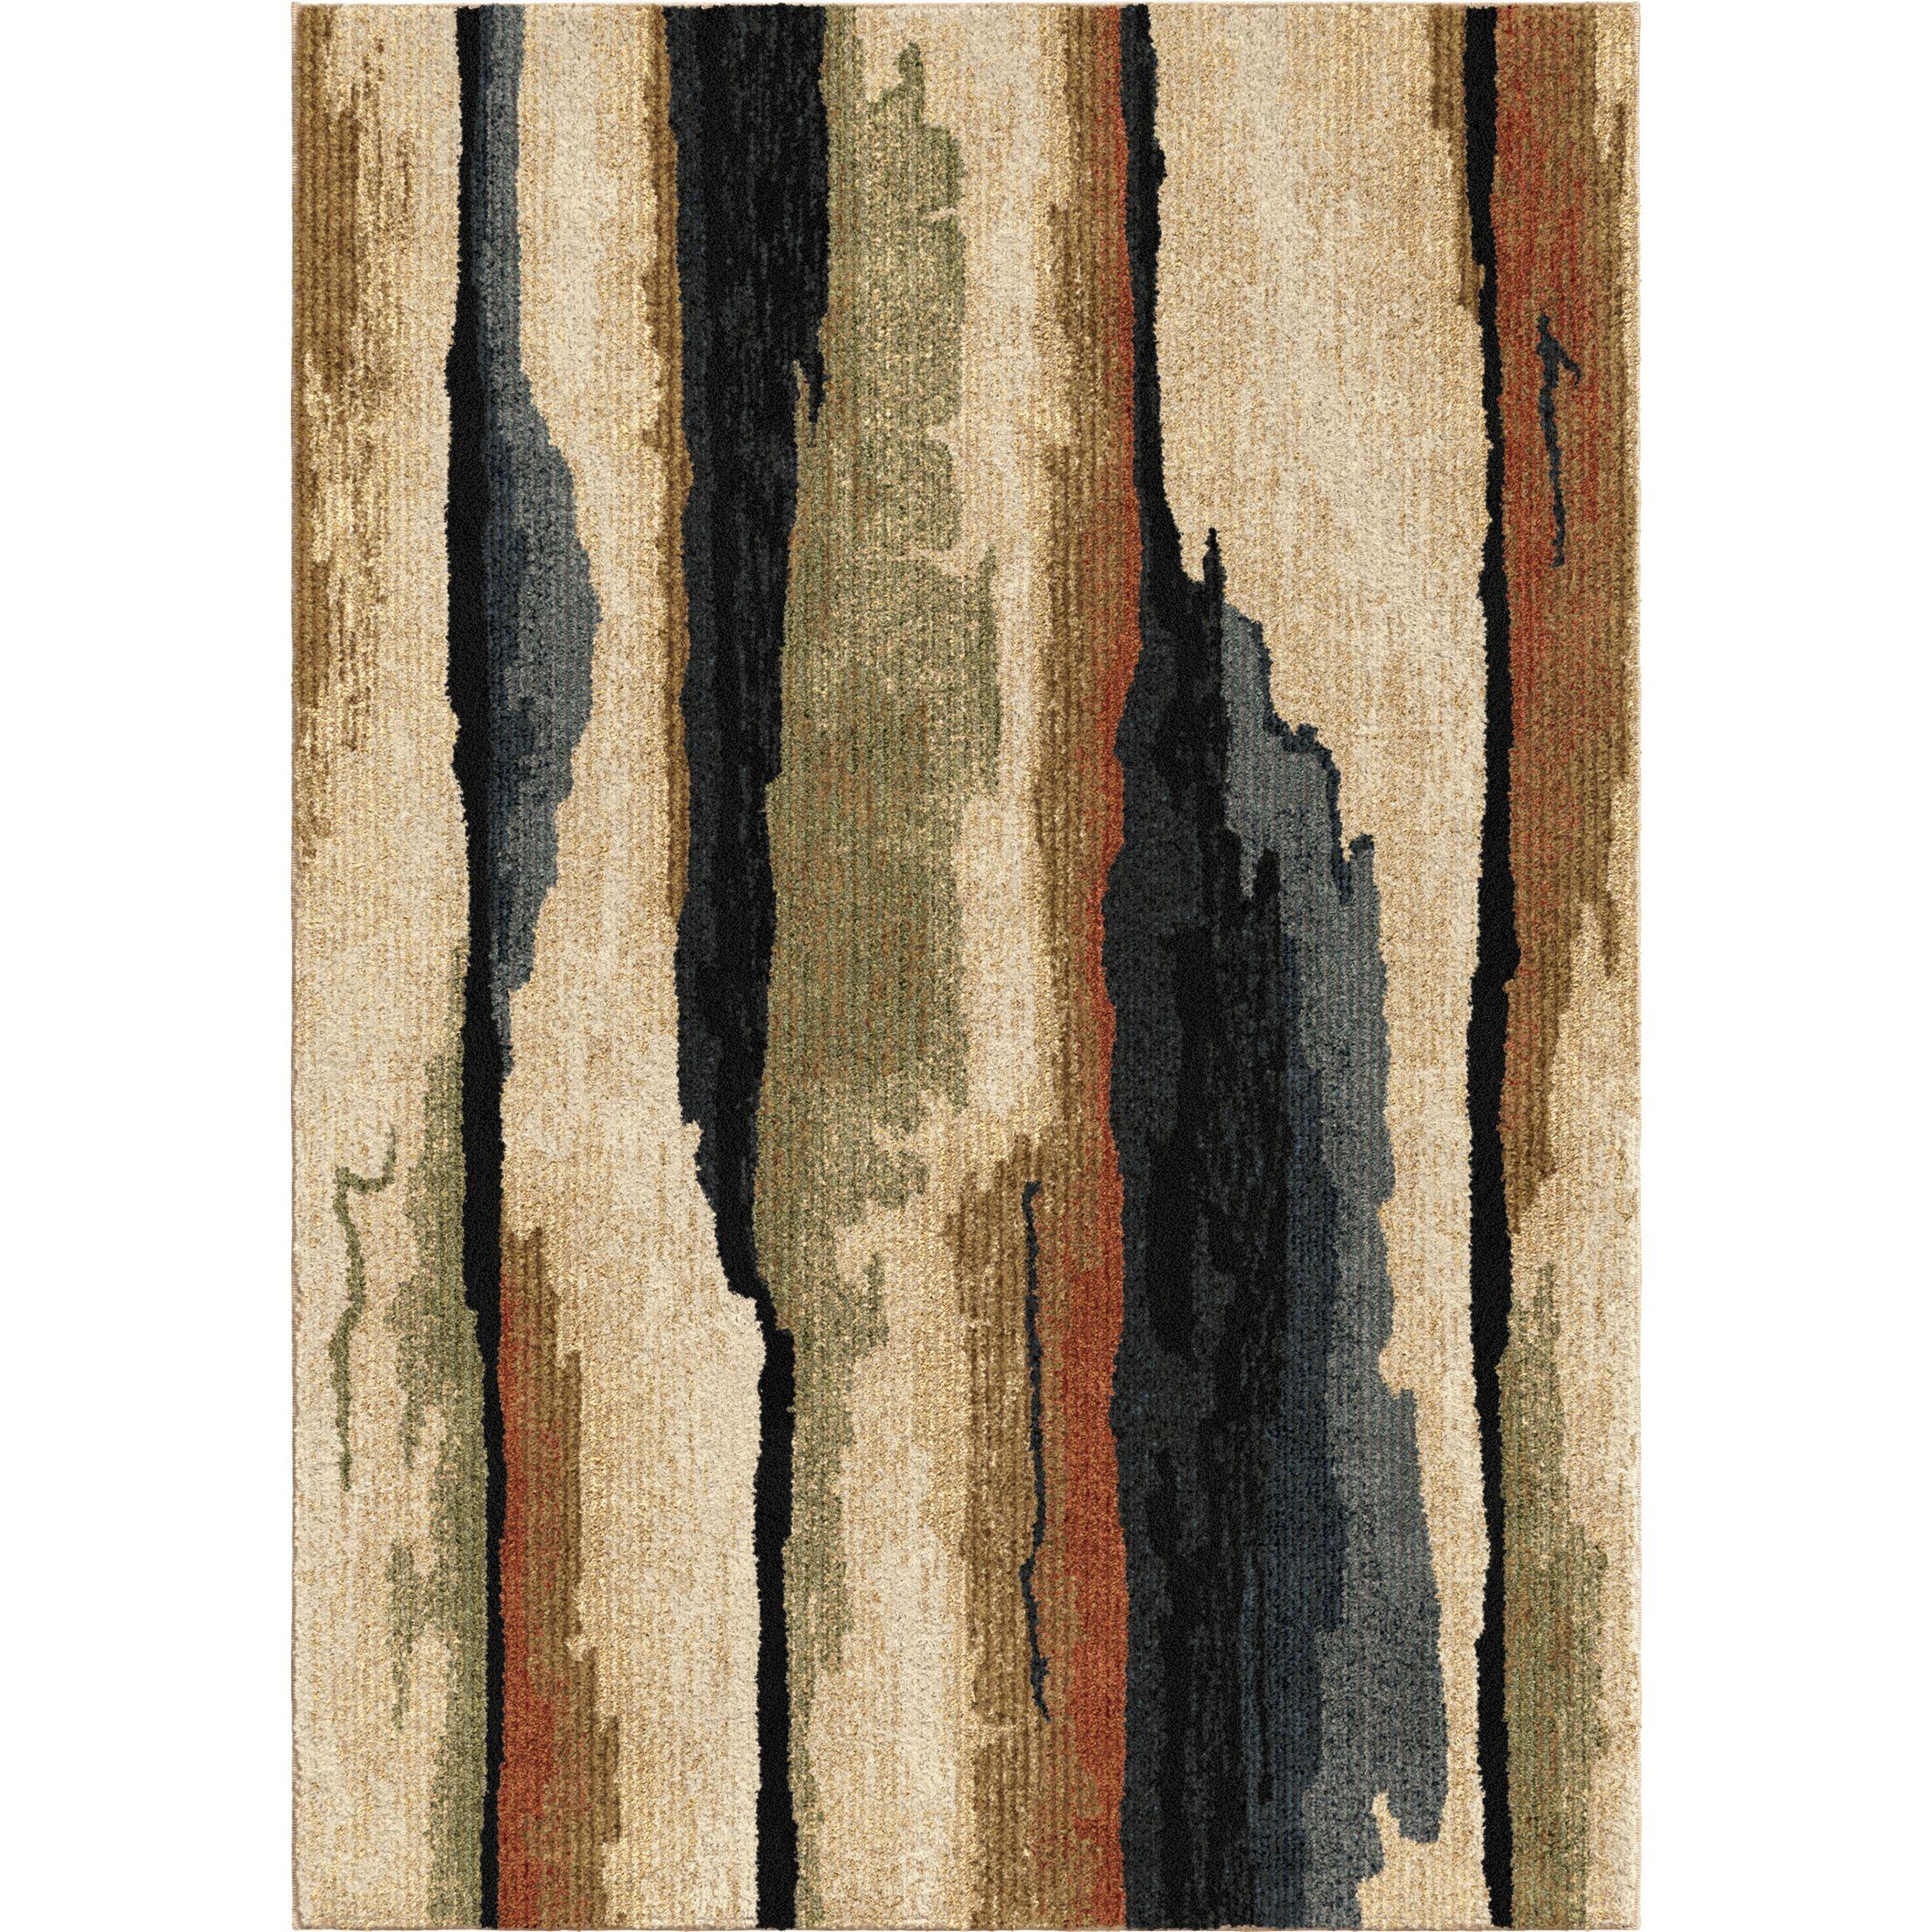 Makushin Beige/Blue/Green Area Rug Rug Size: 5'3